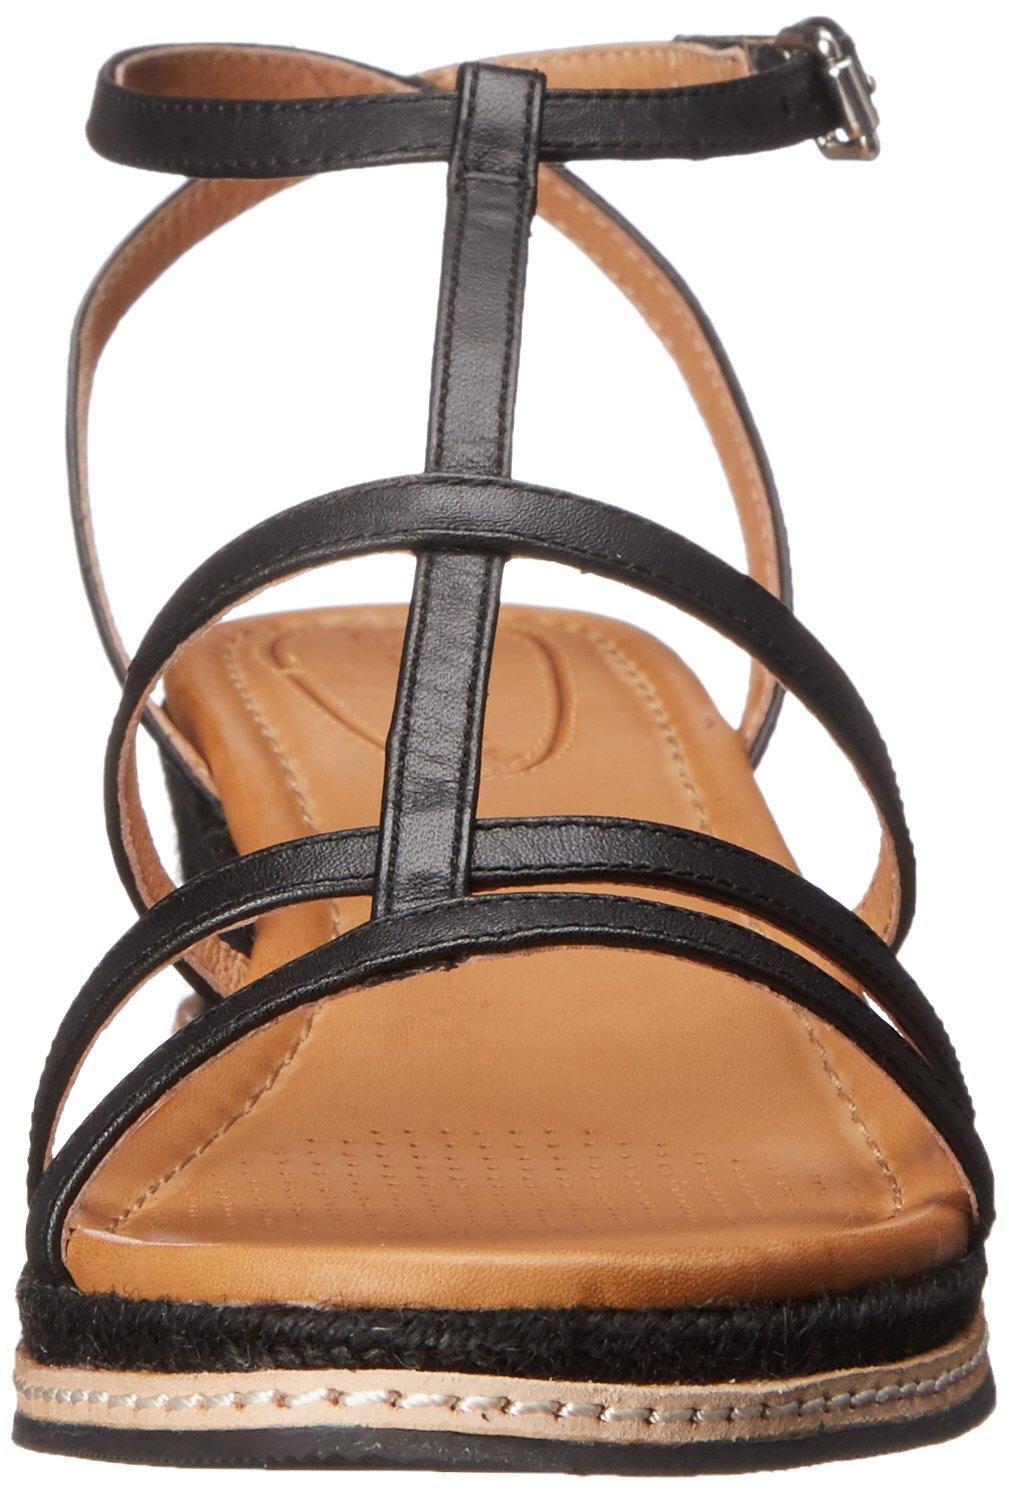 Corso Como Women's Codi Platform Espadrille Sandal B019RGQDN0 9.5 B(M) US|Black Brushed Leather